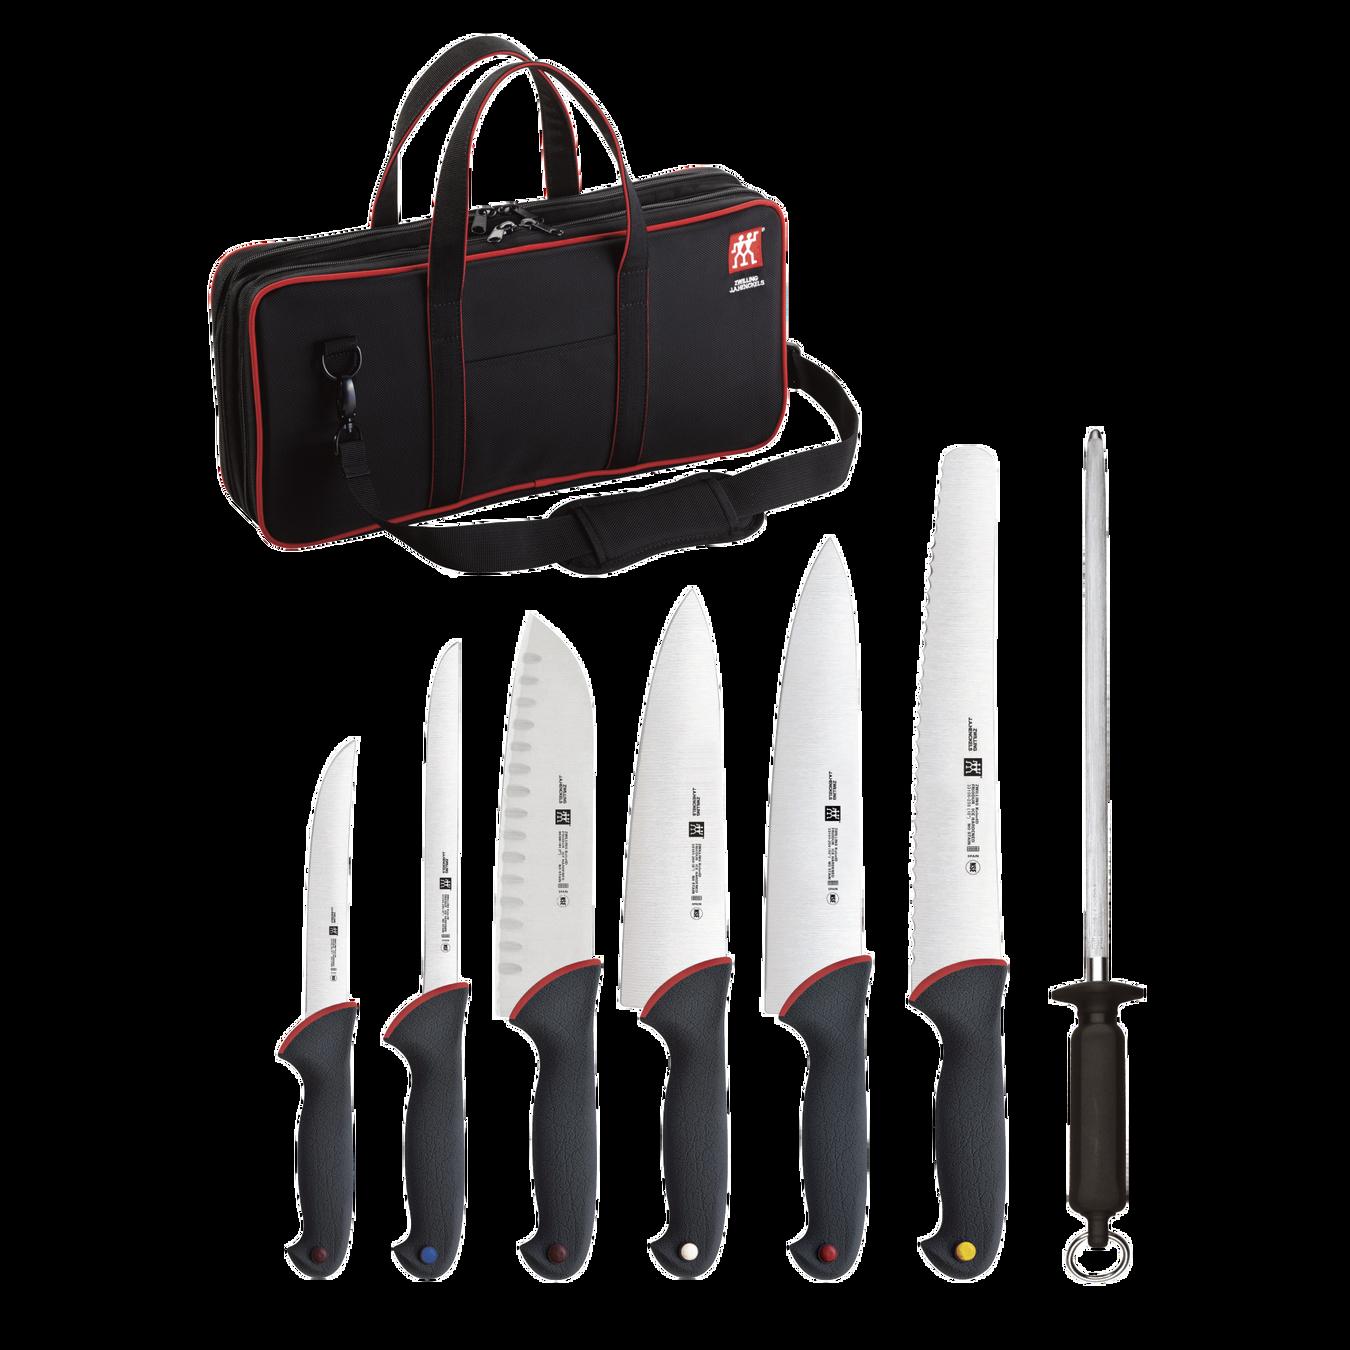 8 Piece Student Chef Knife Set 1